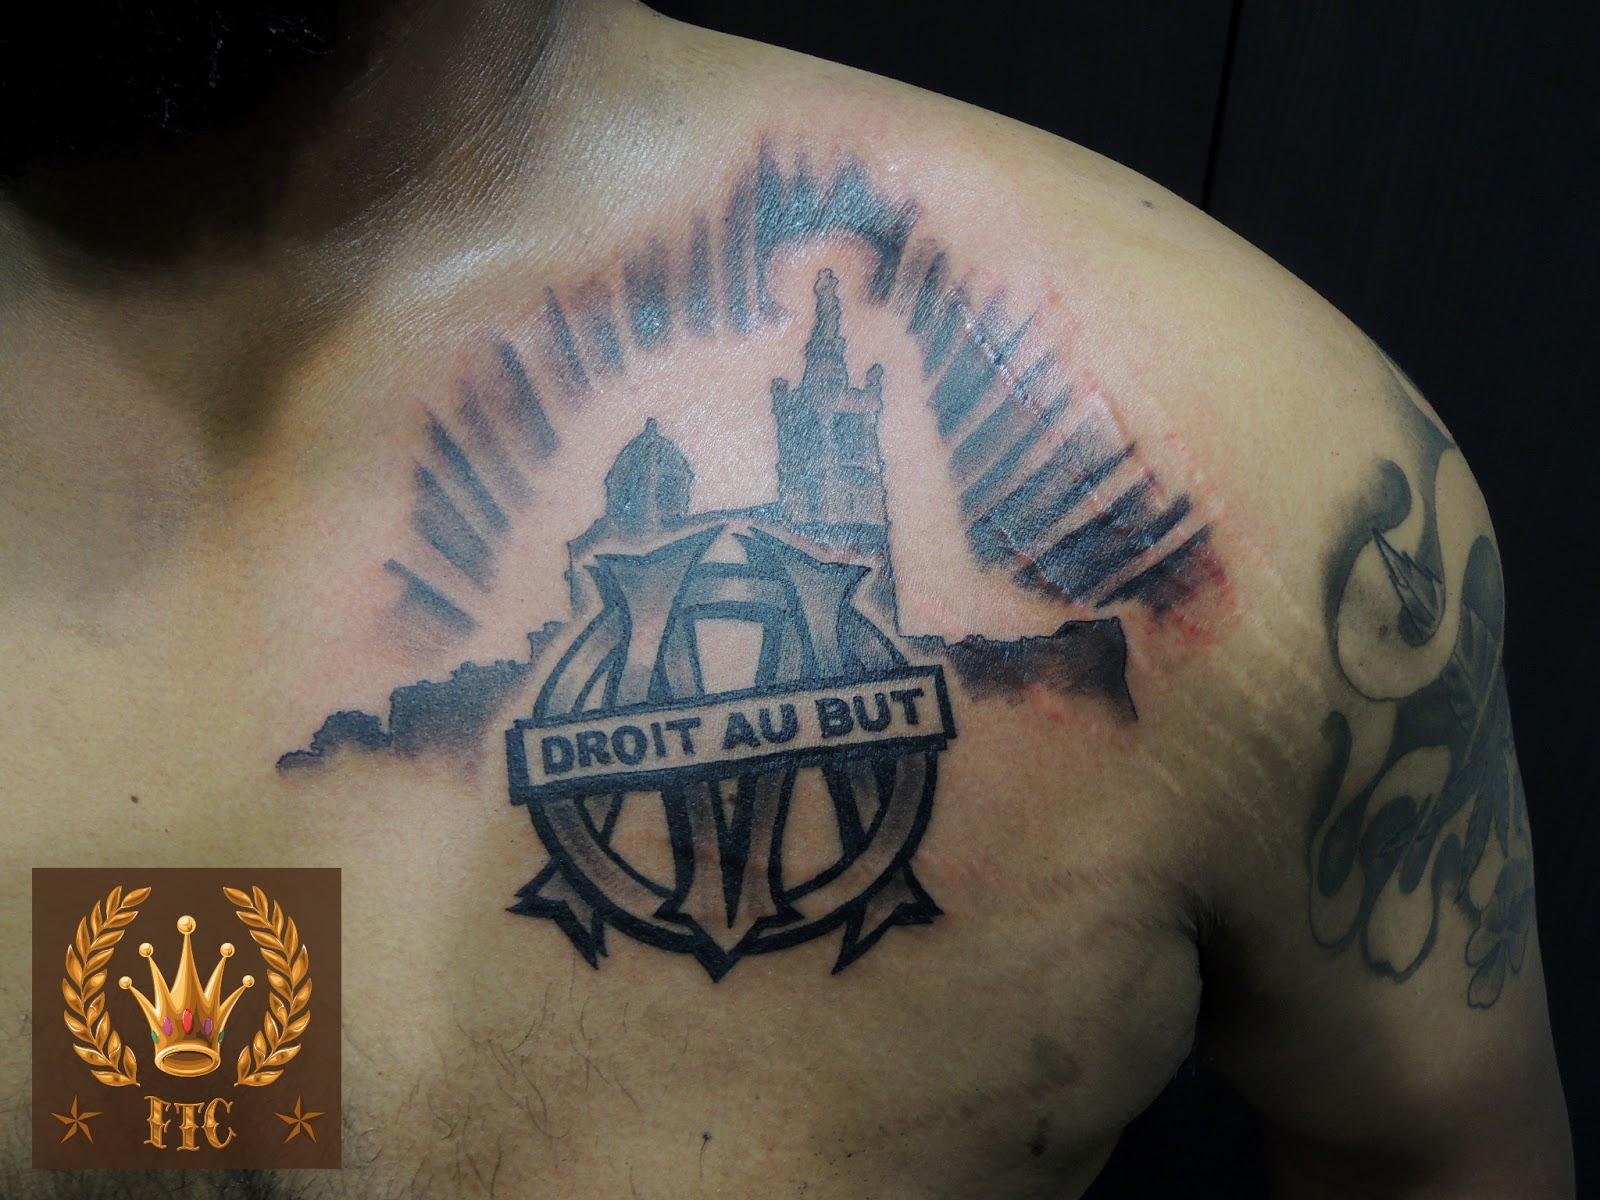 Ftc tatouage bordeaux ici for Notre dame tattoos